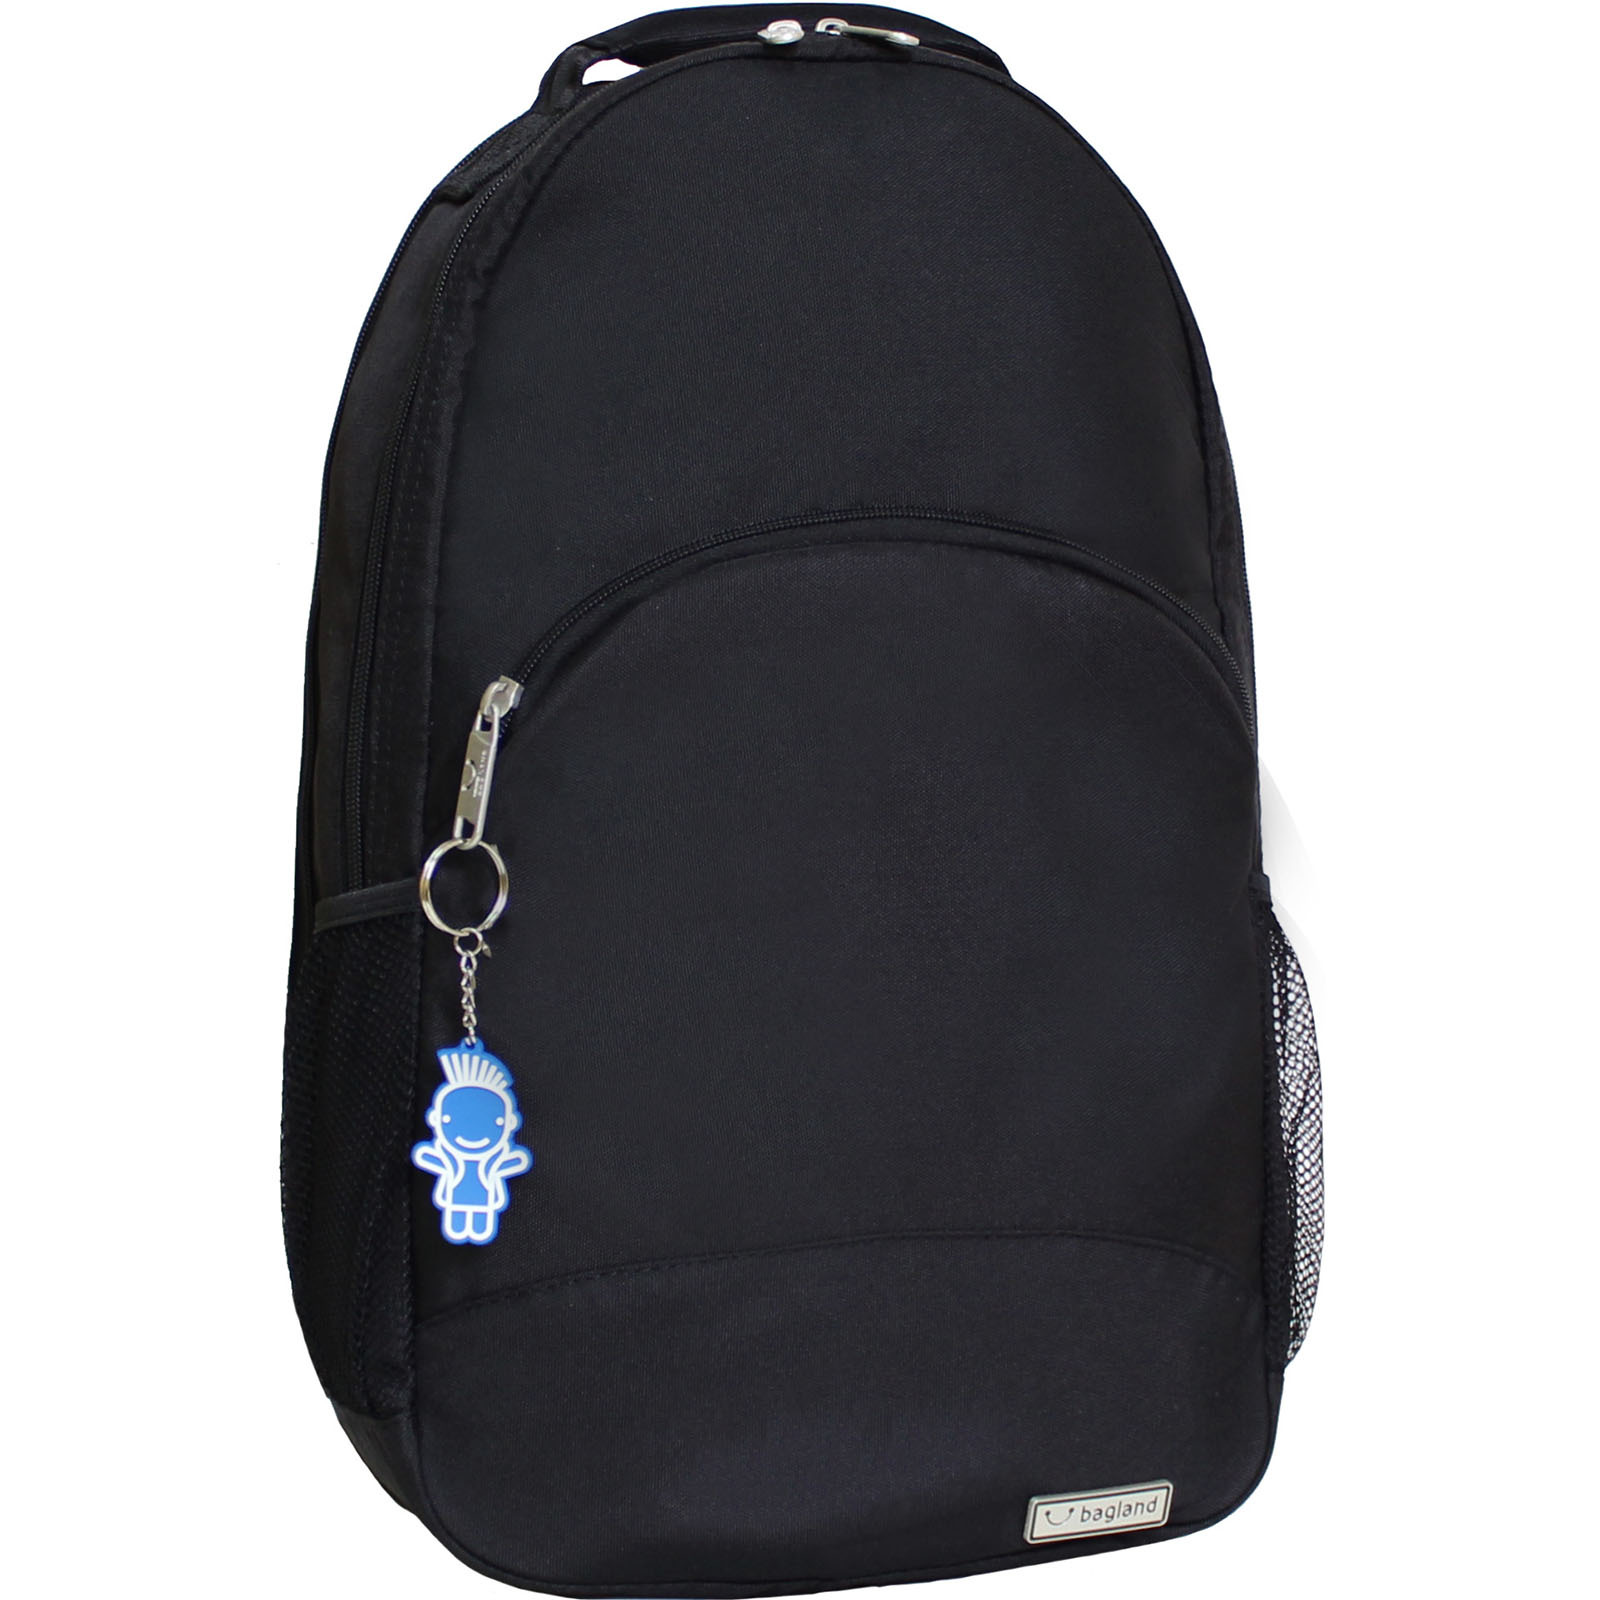 Рюкзаки для ноутбука Рюкзак Bagland UltraMax 20 л. черный (00534662) IMG_3967.JPG